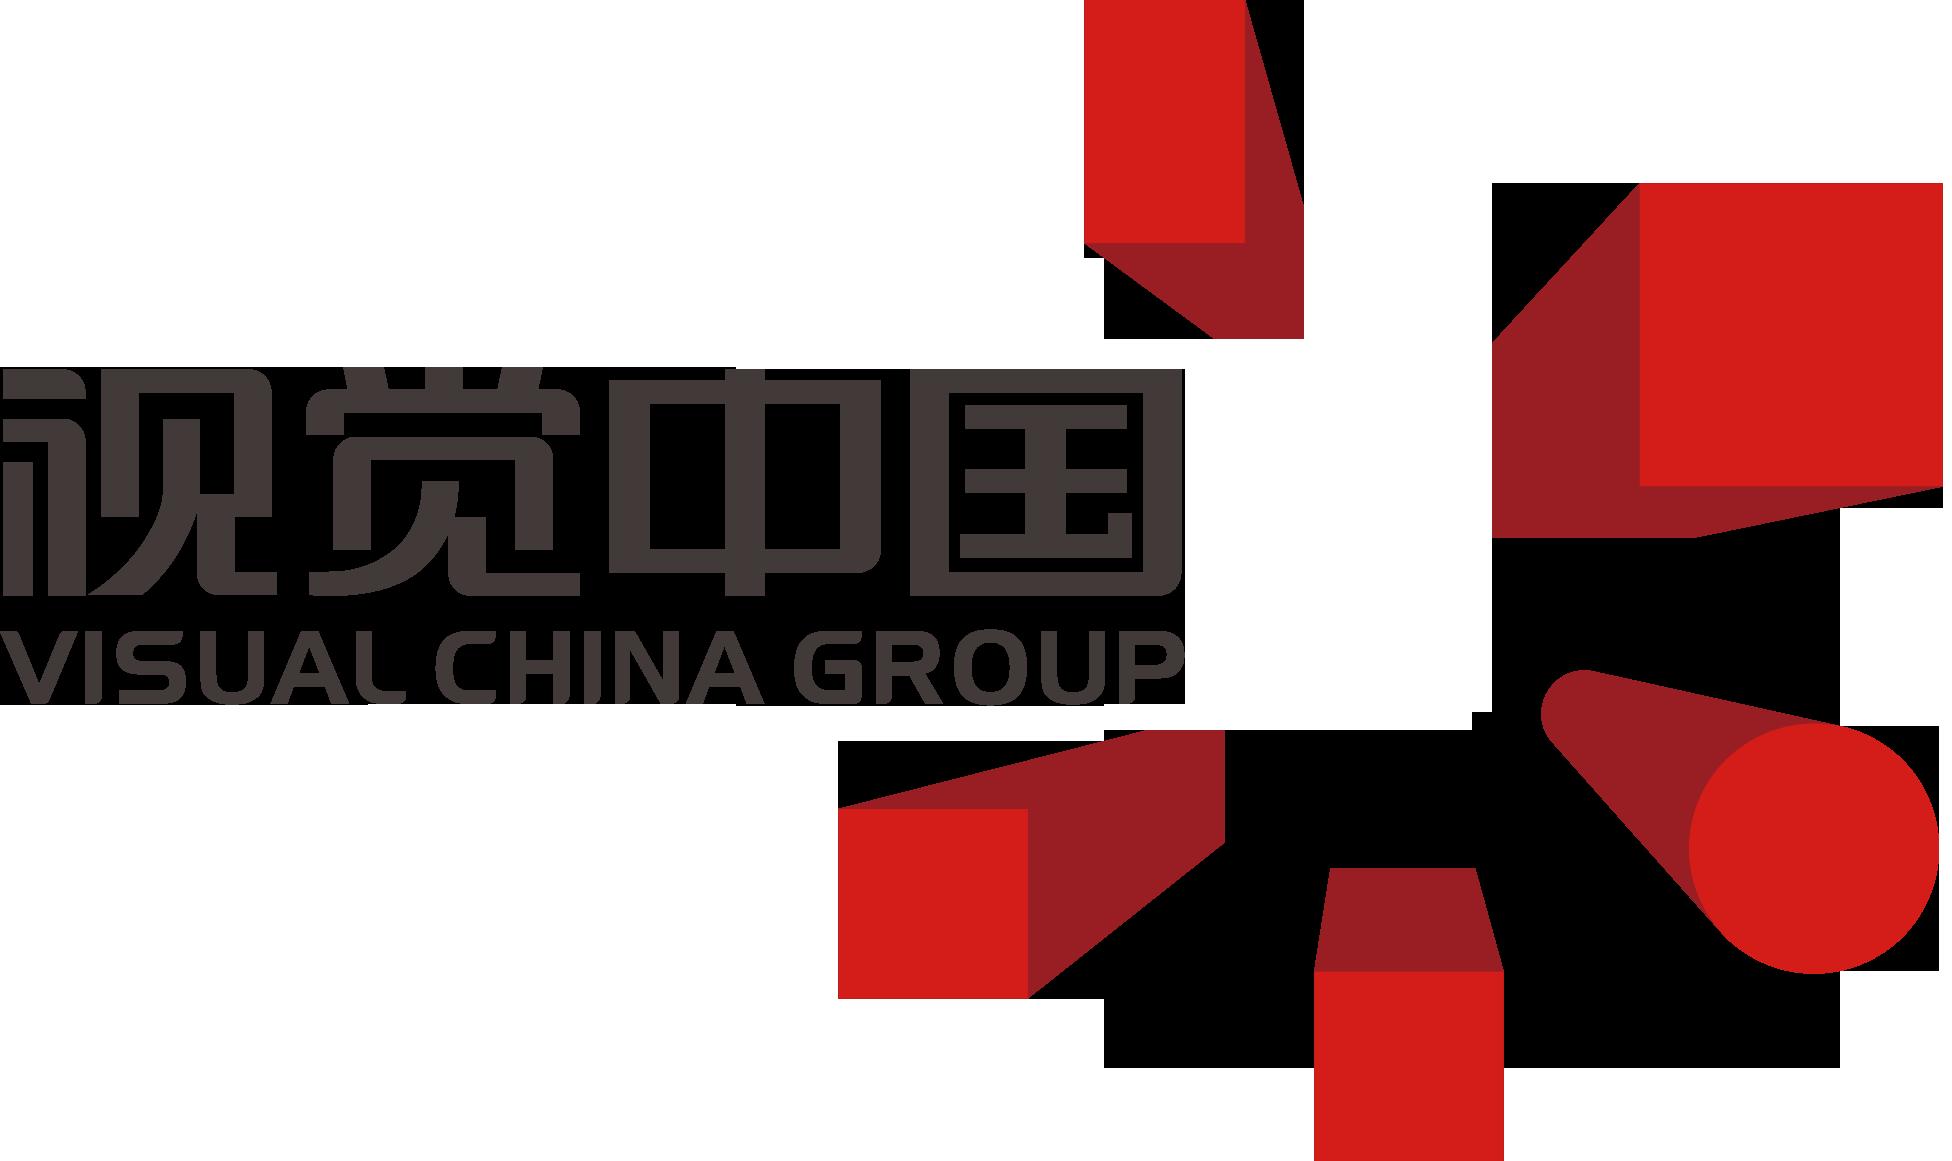 視覺中國logo.png